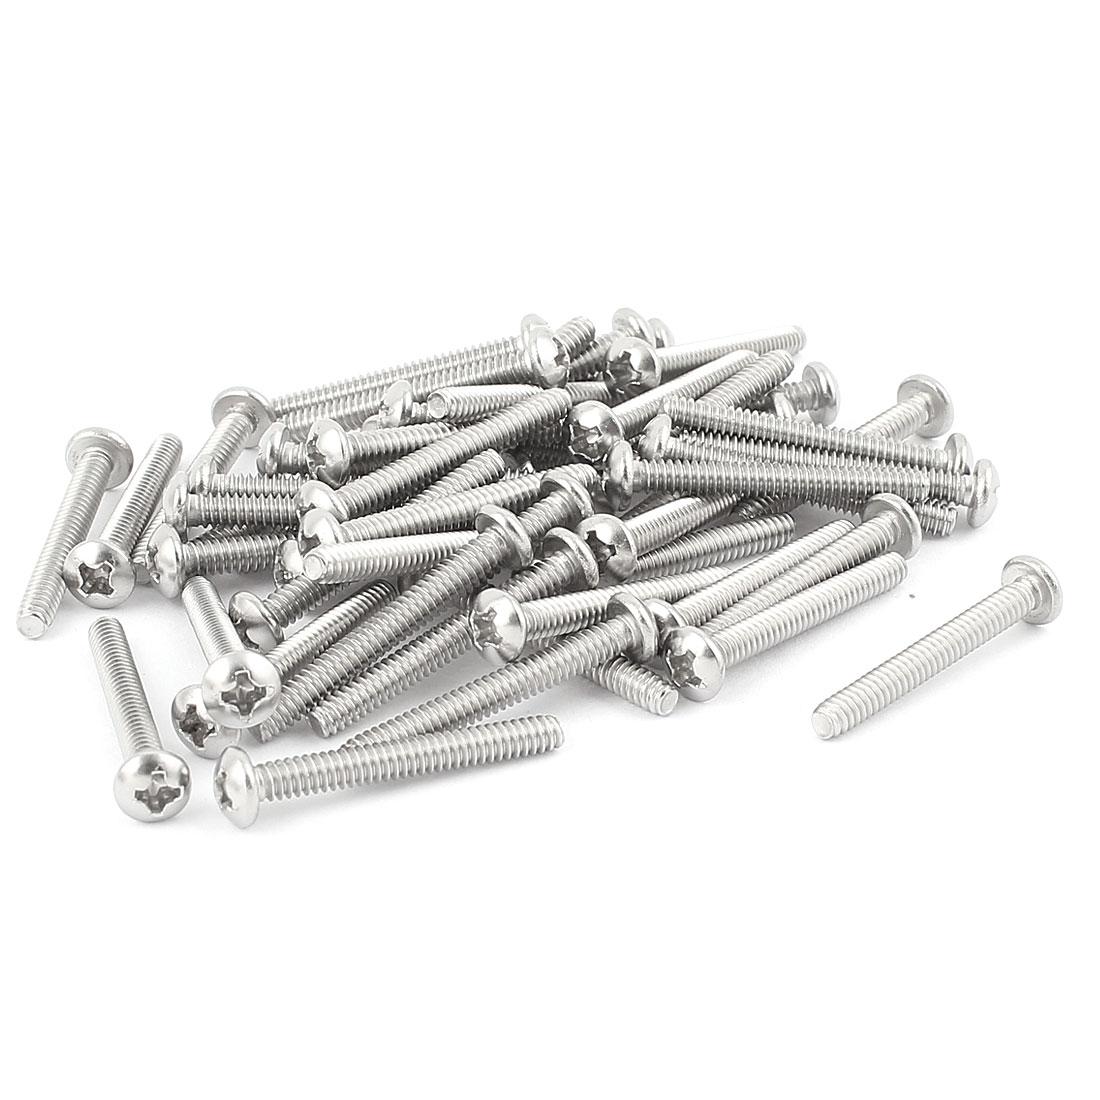 "50 Pcs #6-32 x 1 1/8"" Stainless Steel Phillips Truss Head Bolts Machine Screws"